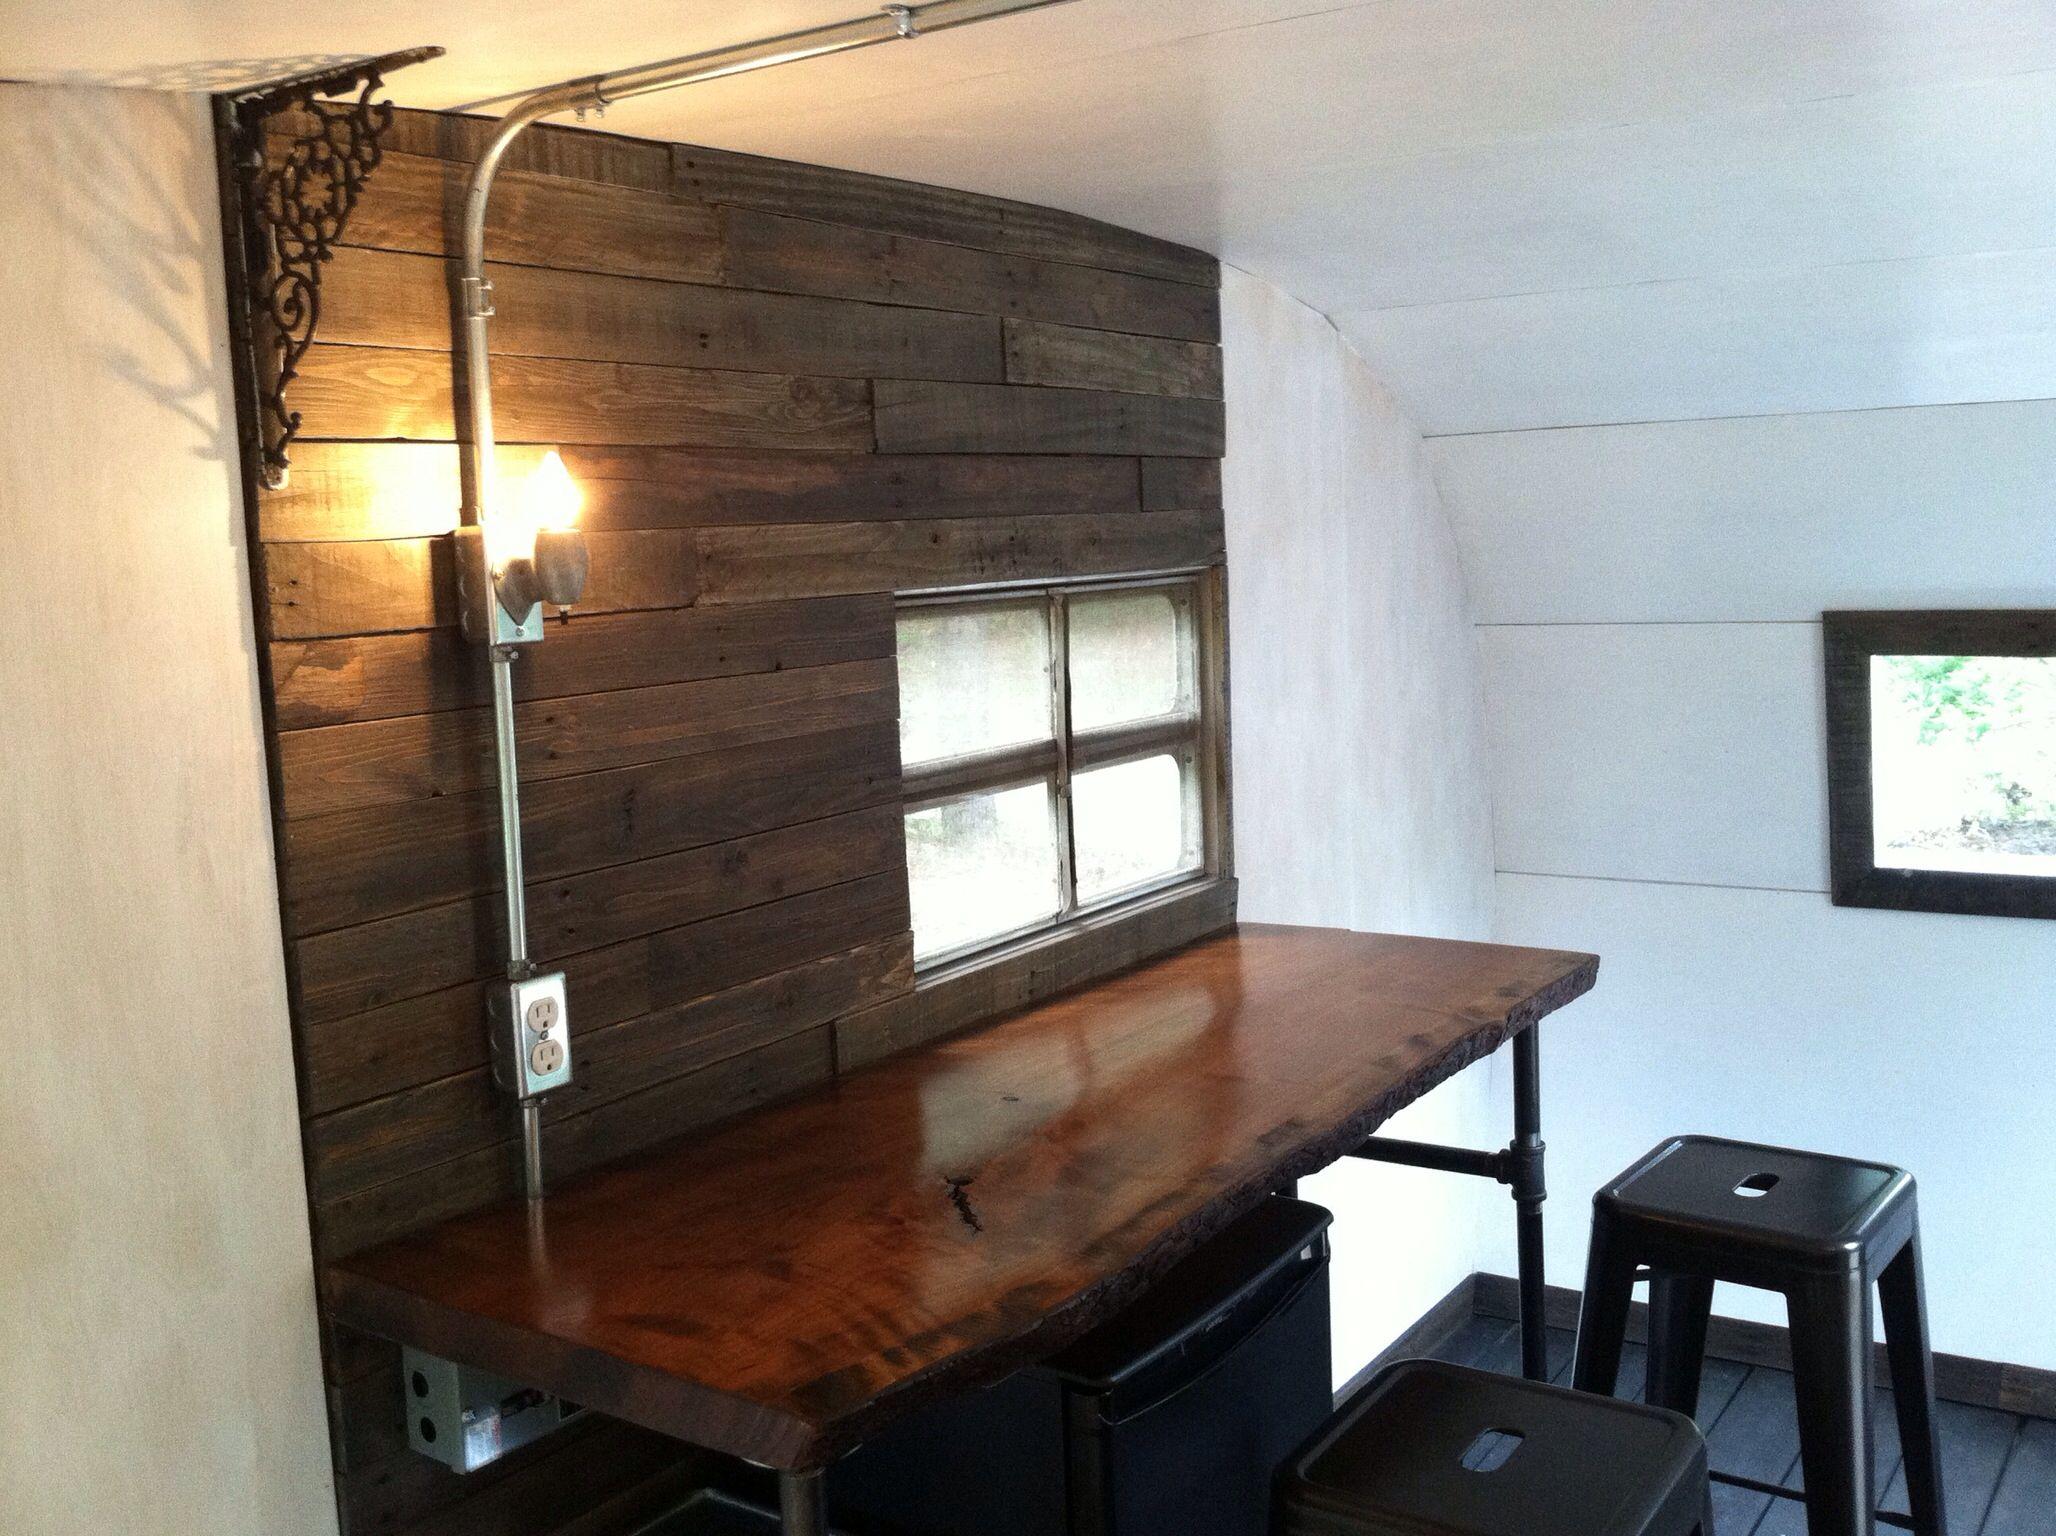 Vintage Camper Interior Renovation Pallet Wall Raw Edge Wood Slab Board Counter Rustic